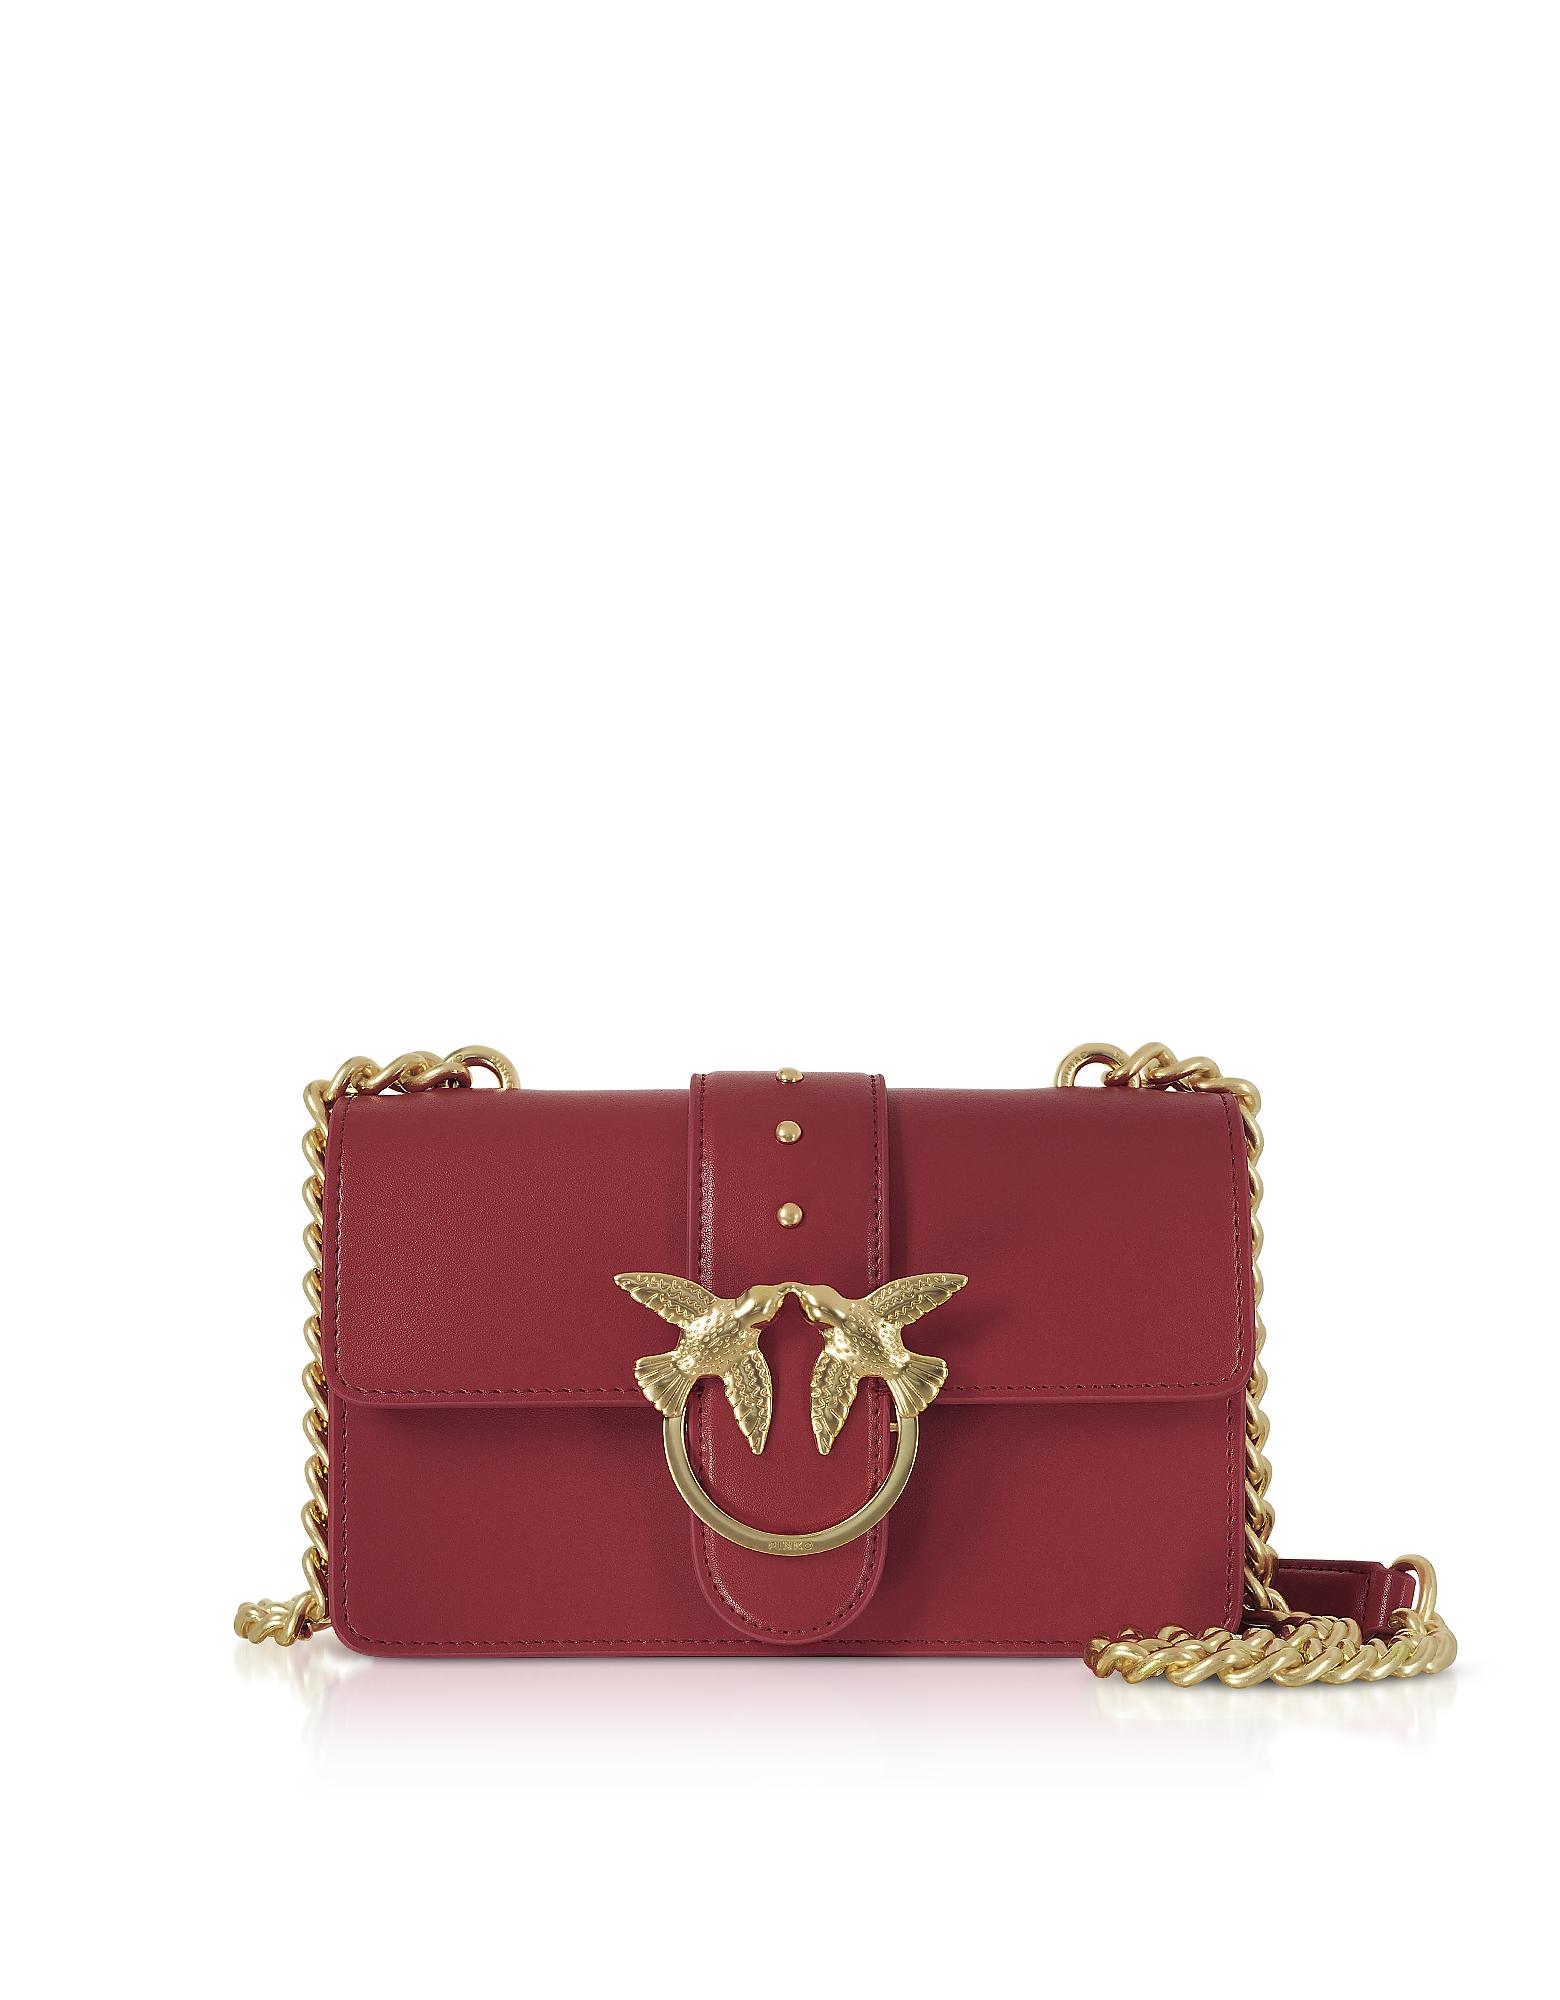 Pinko Designer Handbags, Mini Love Crossbody Bag